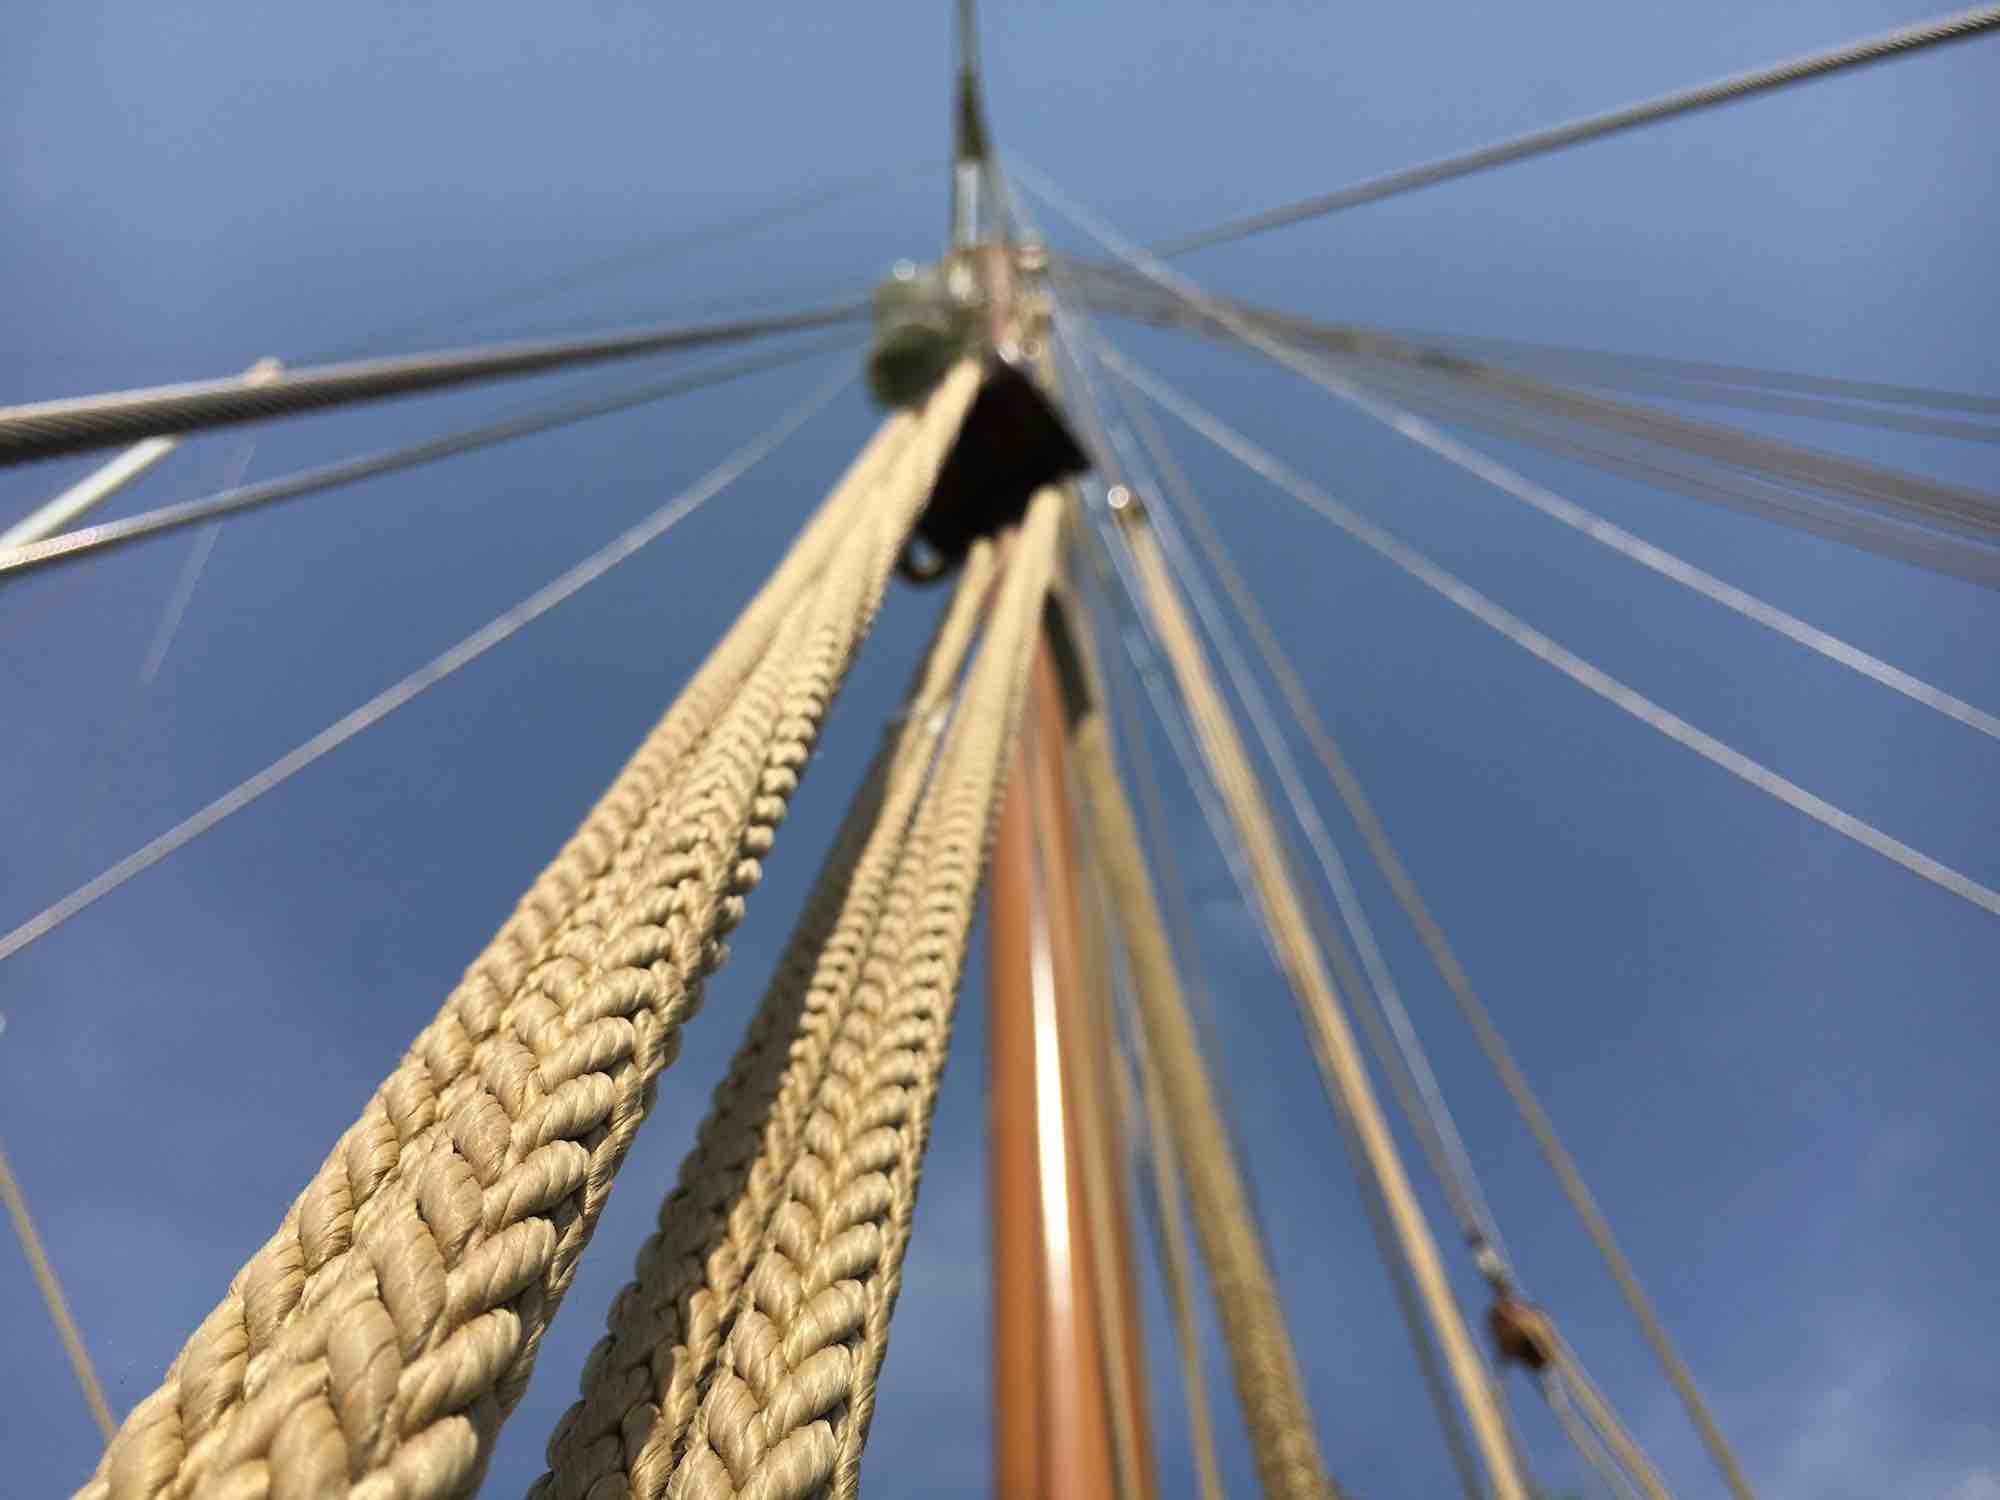 Dallinghoo_low angle shot of mast against blue sky yacht holiday in Mergui_XS.jpeg